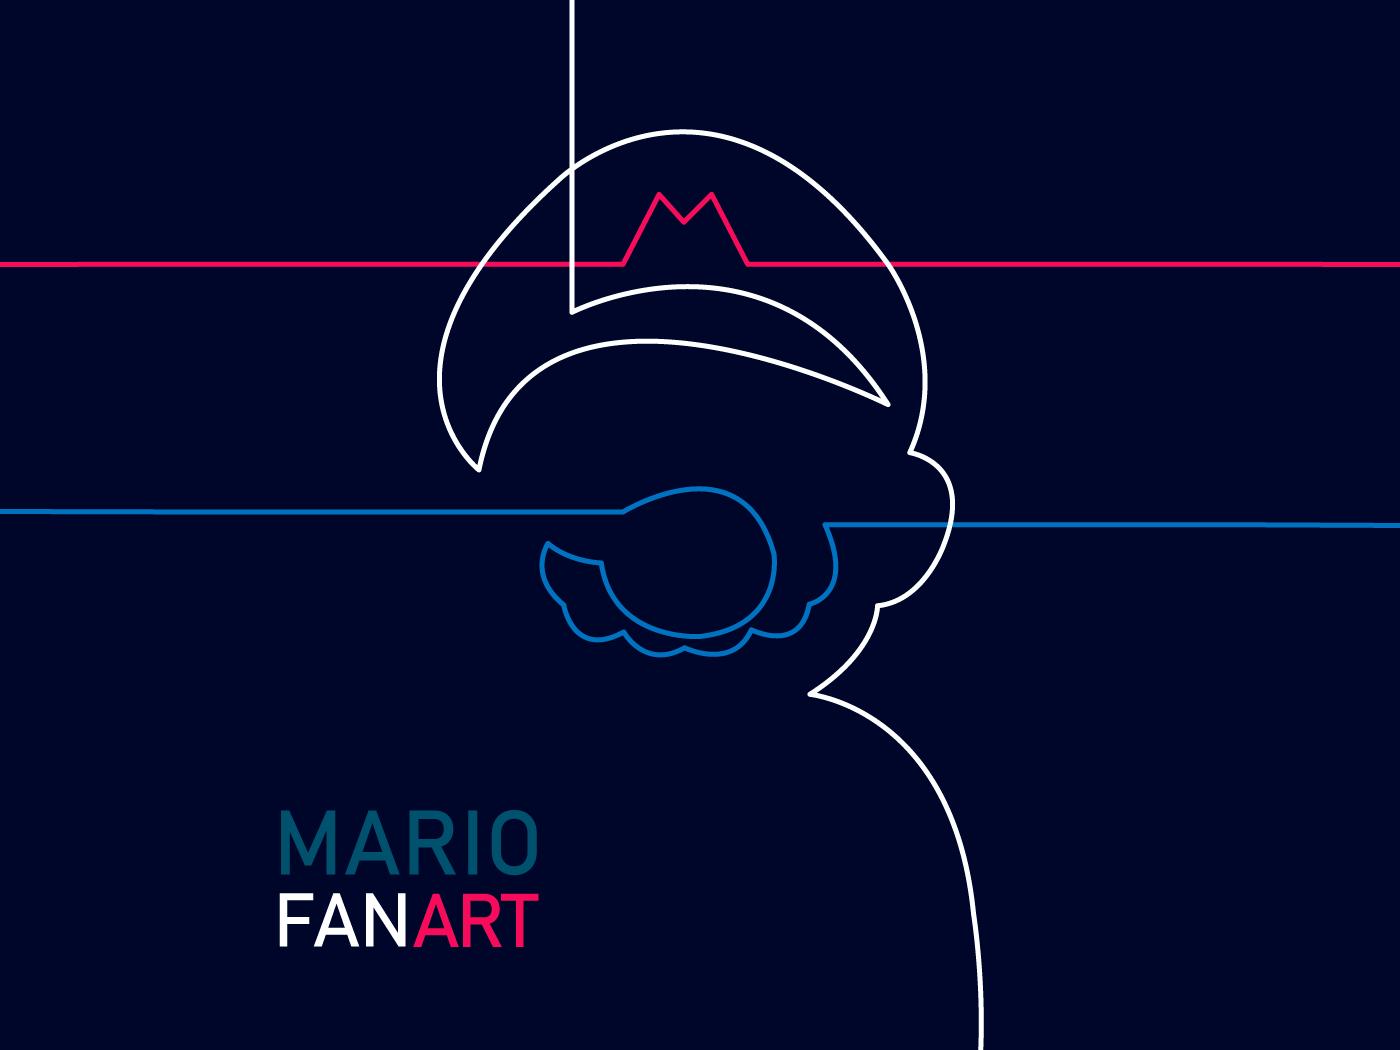 Mario Bros Fan Art wii nintendo switch gameboy nintendo64 supernintendo videogames games minimal illustrator fantart nintendo mario mariobros